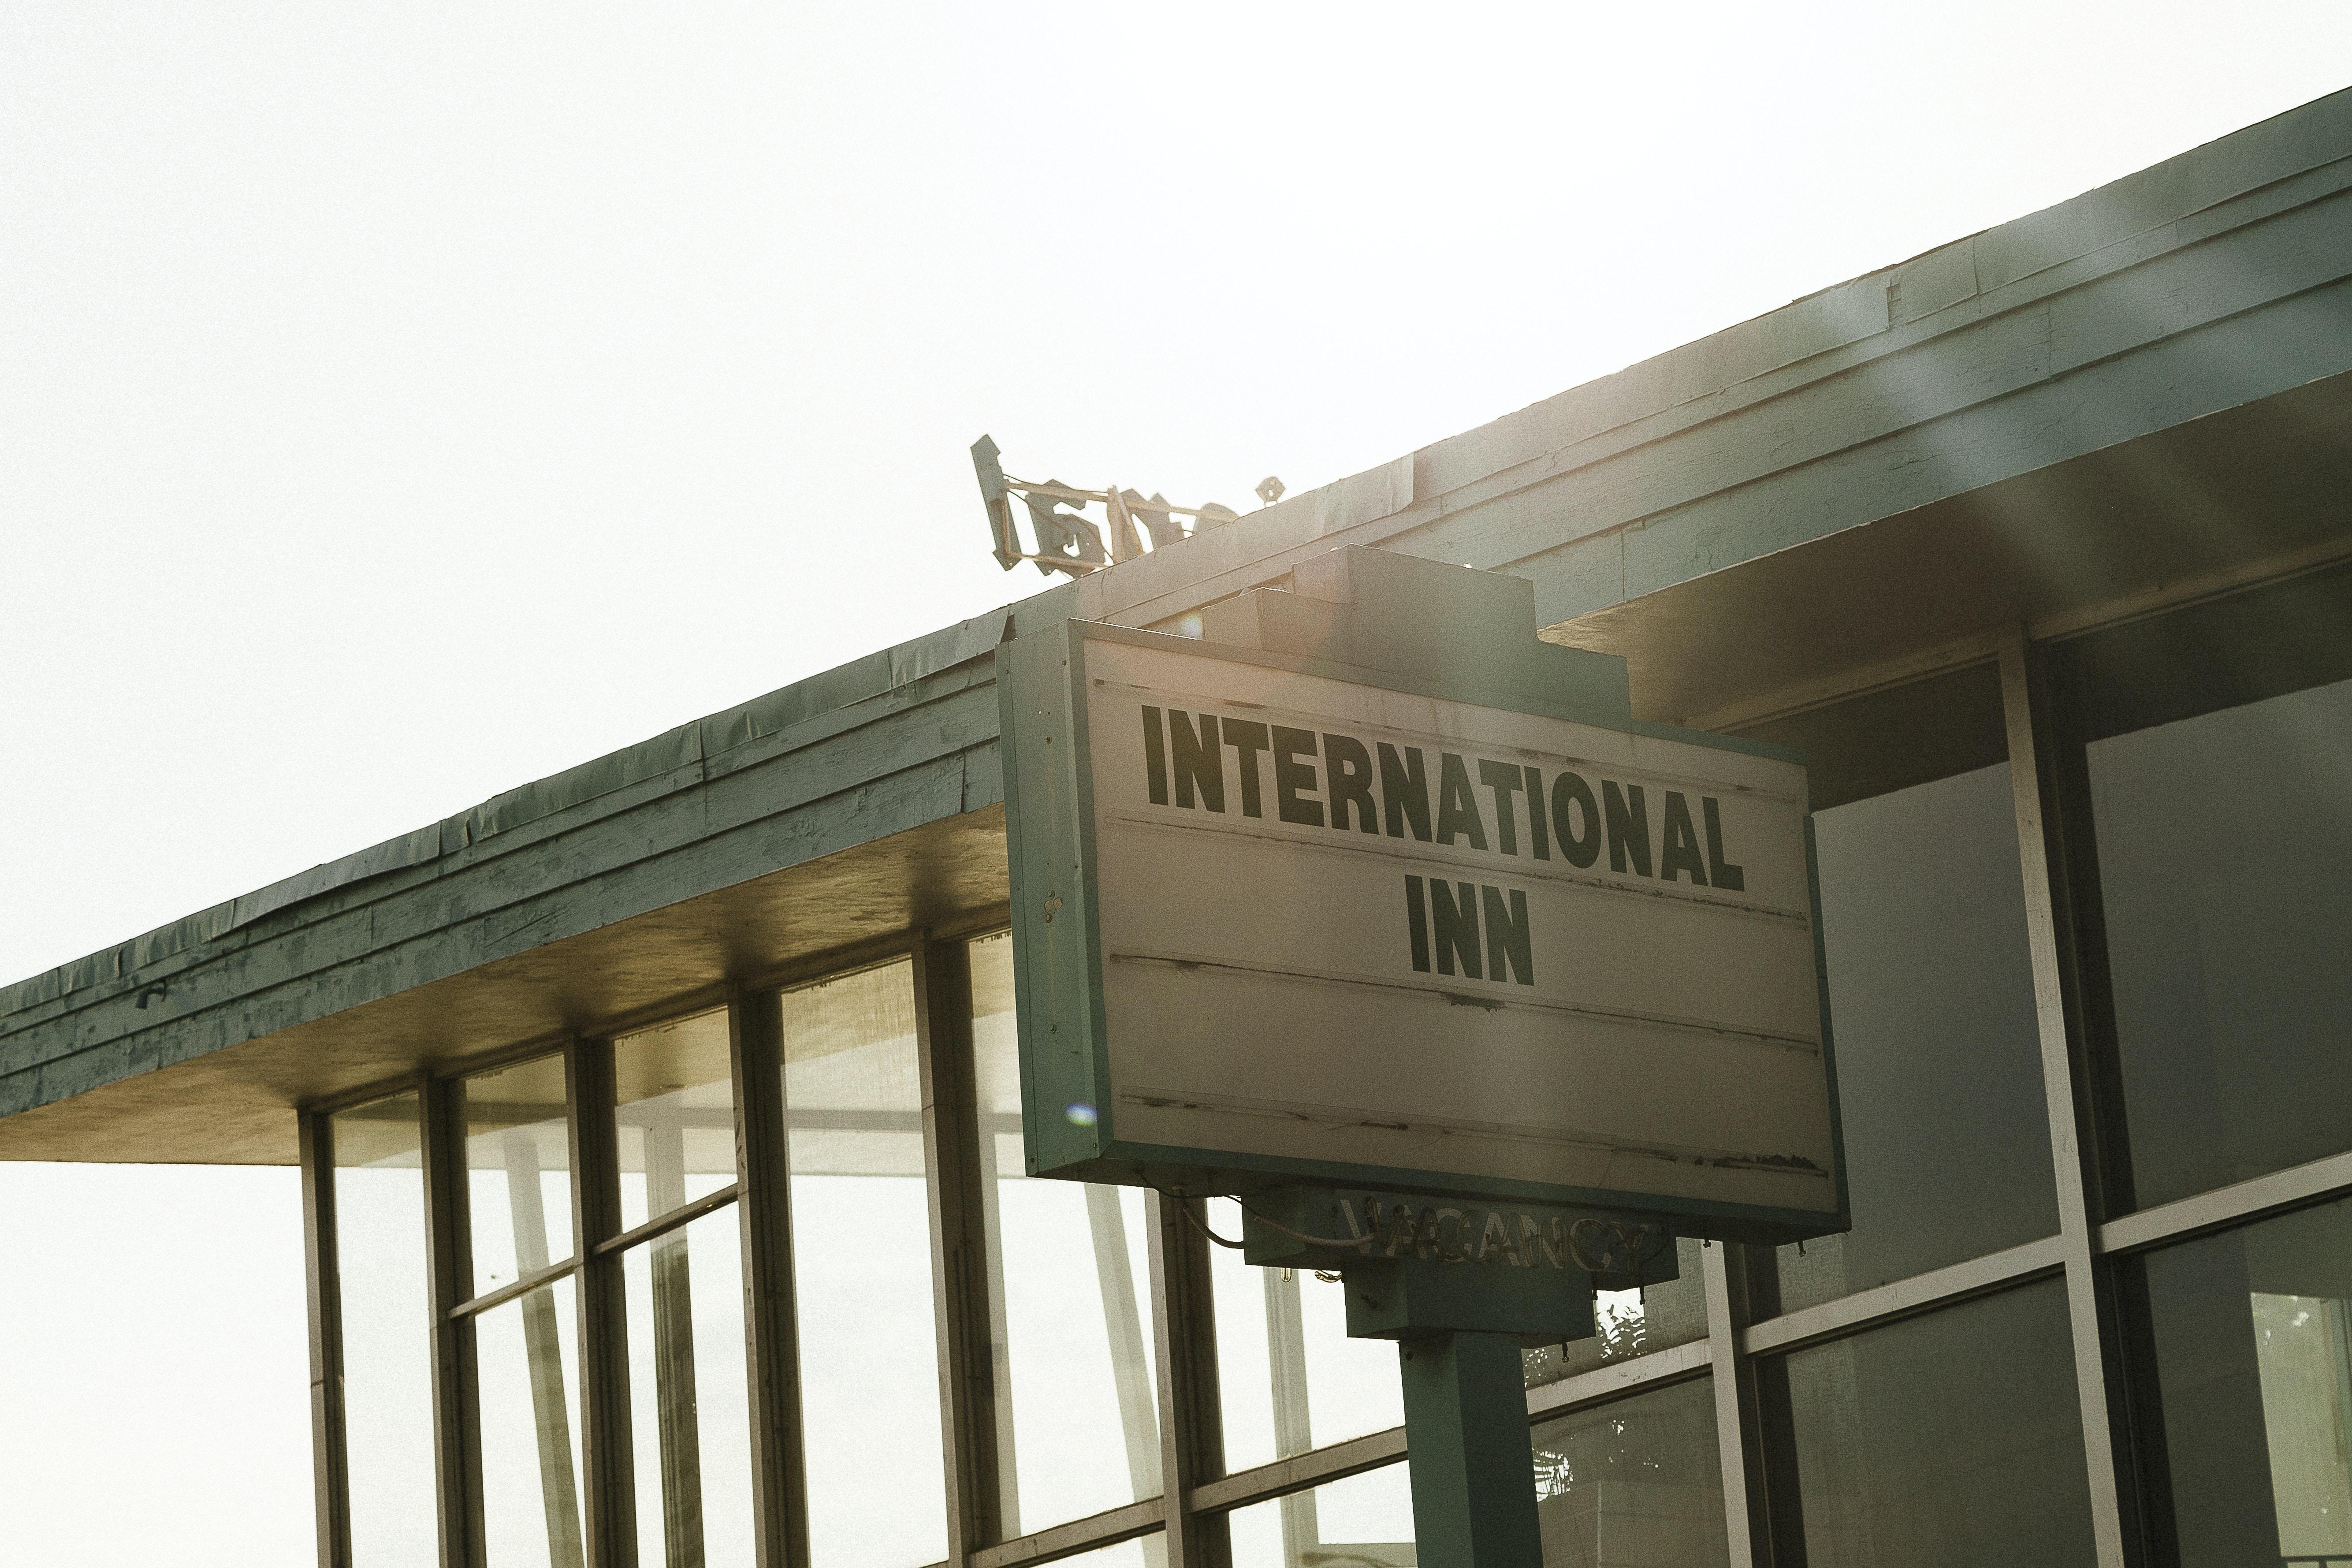 International Inn sign